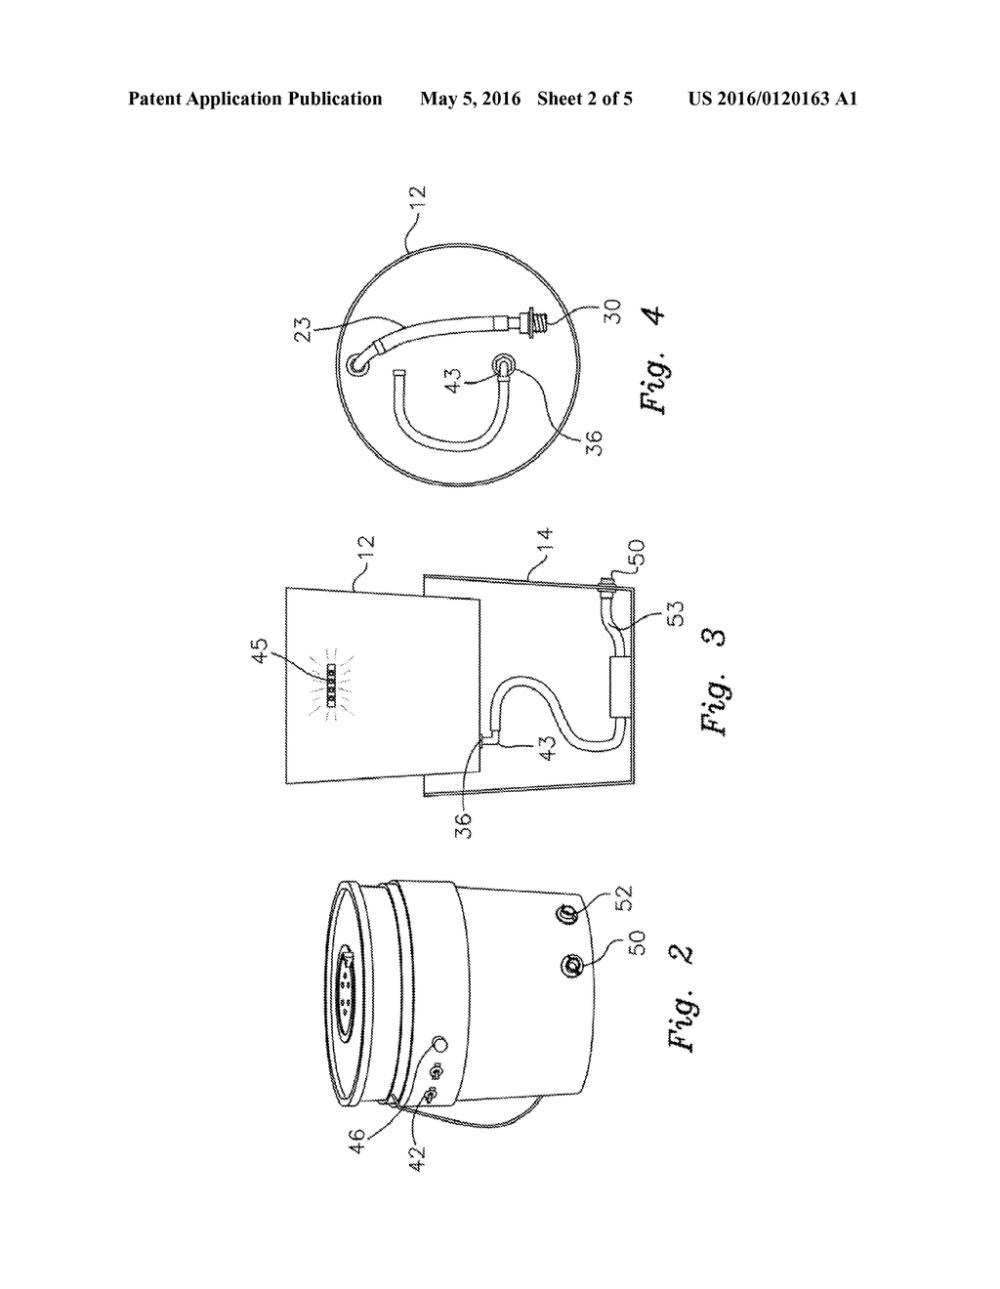 medium resolution of bait bucket with self priming pump and venturi diagram schematic and image 03